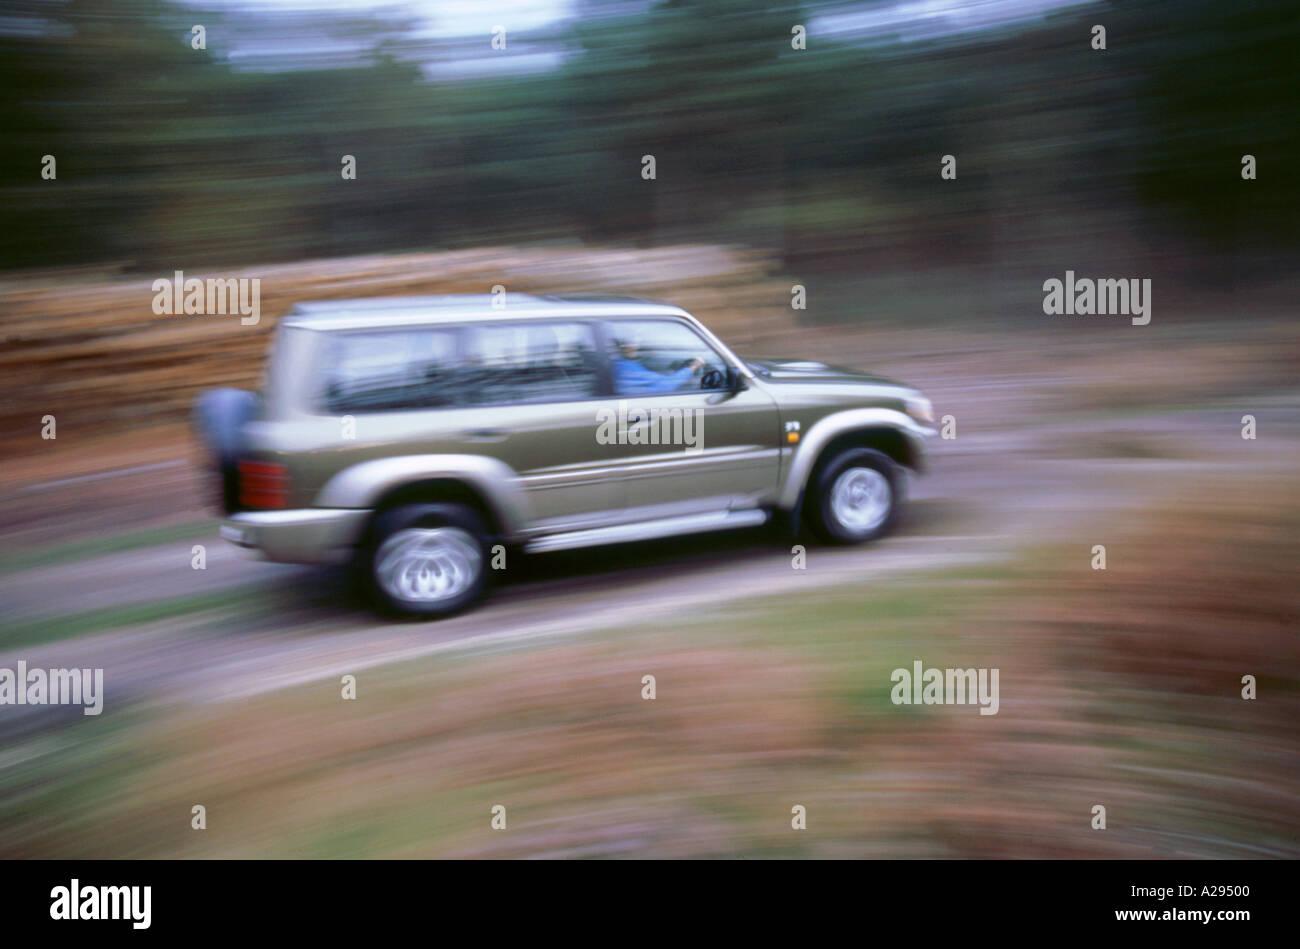 1998 Nissan Patrol GR - Stock Image